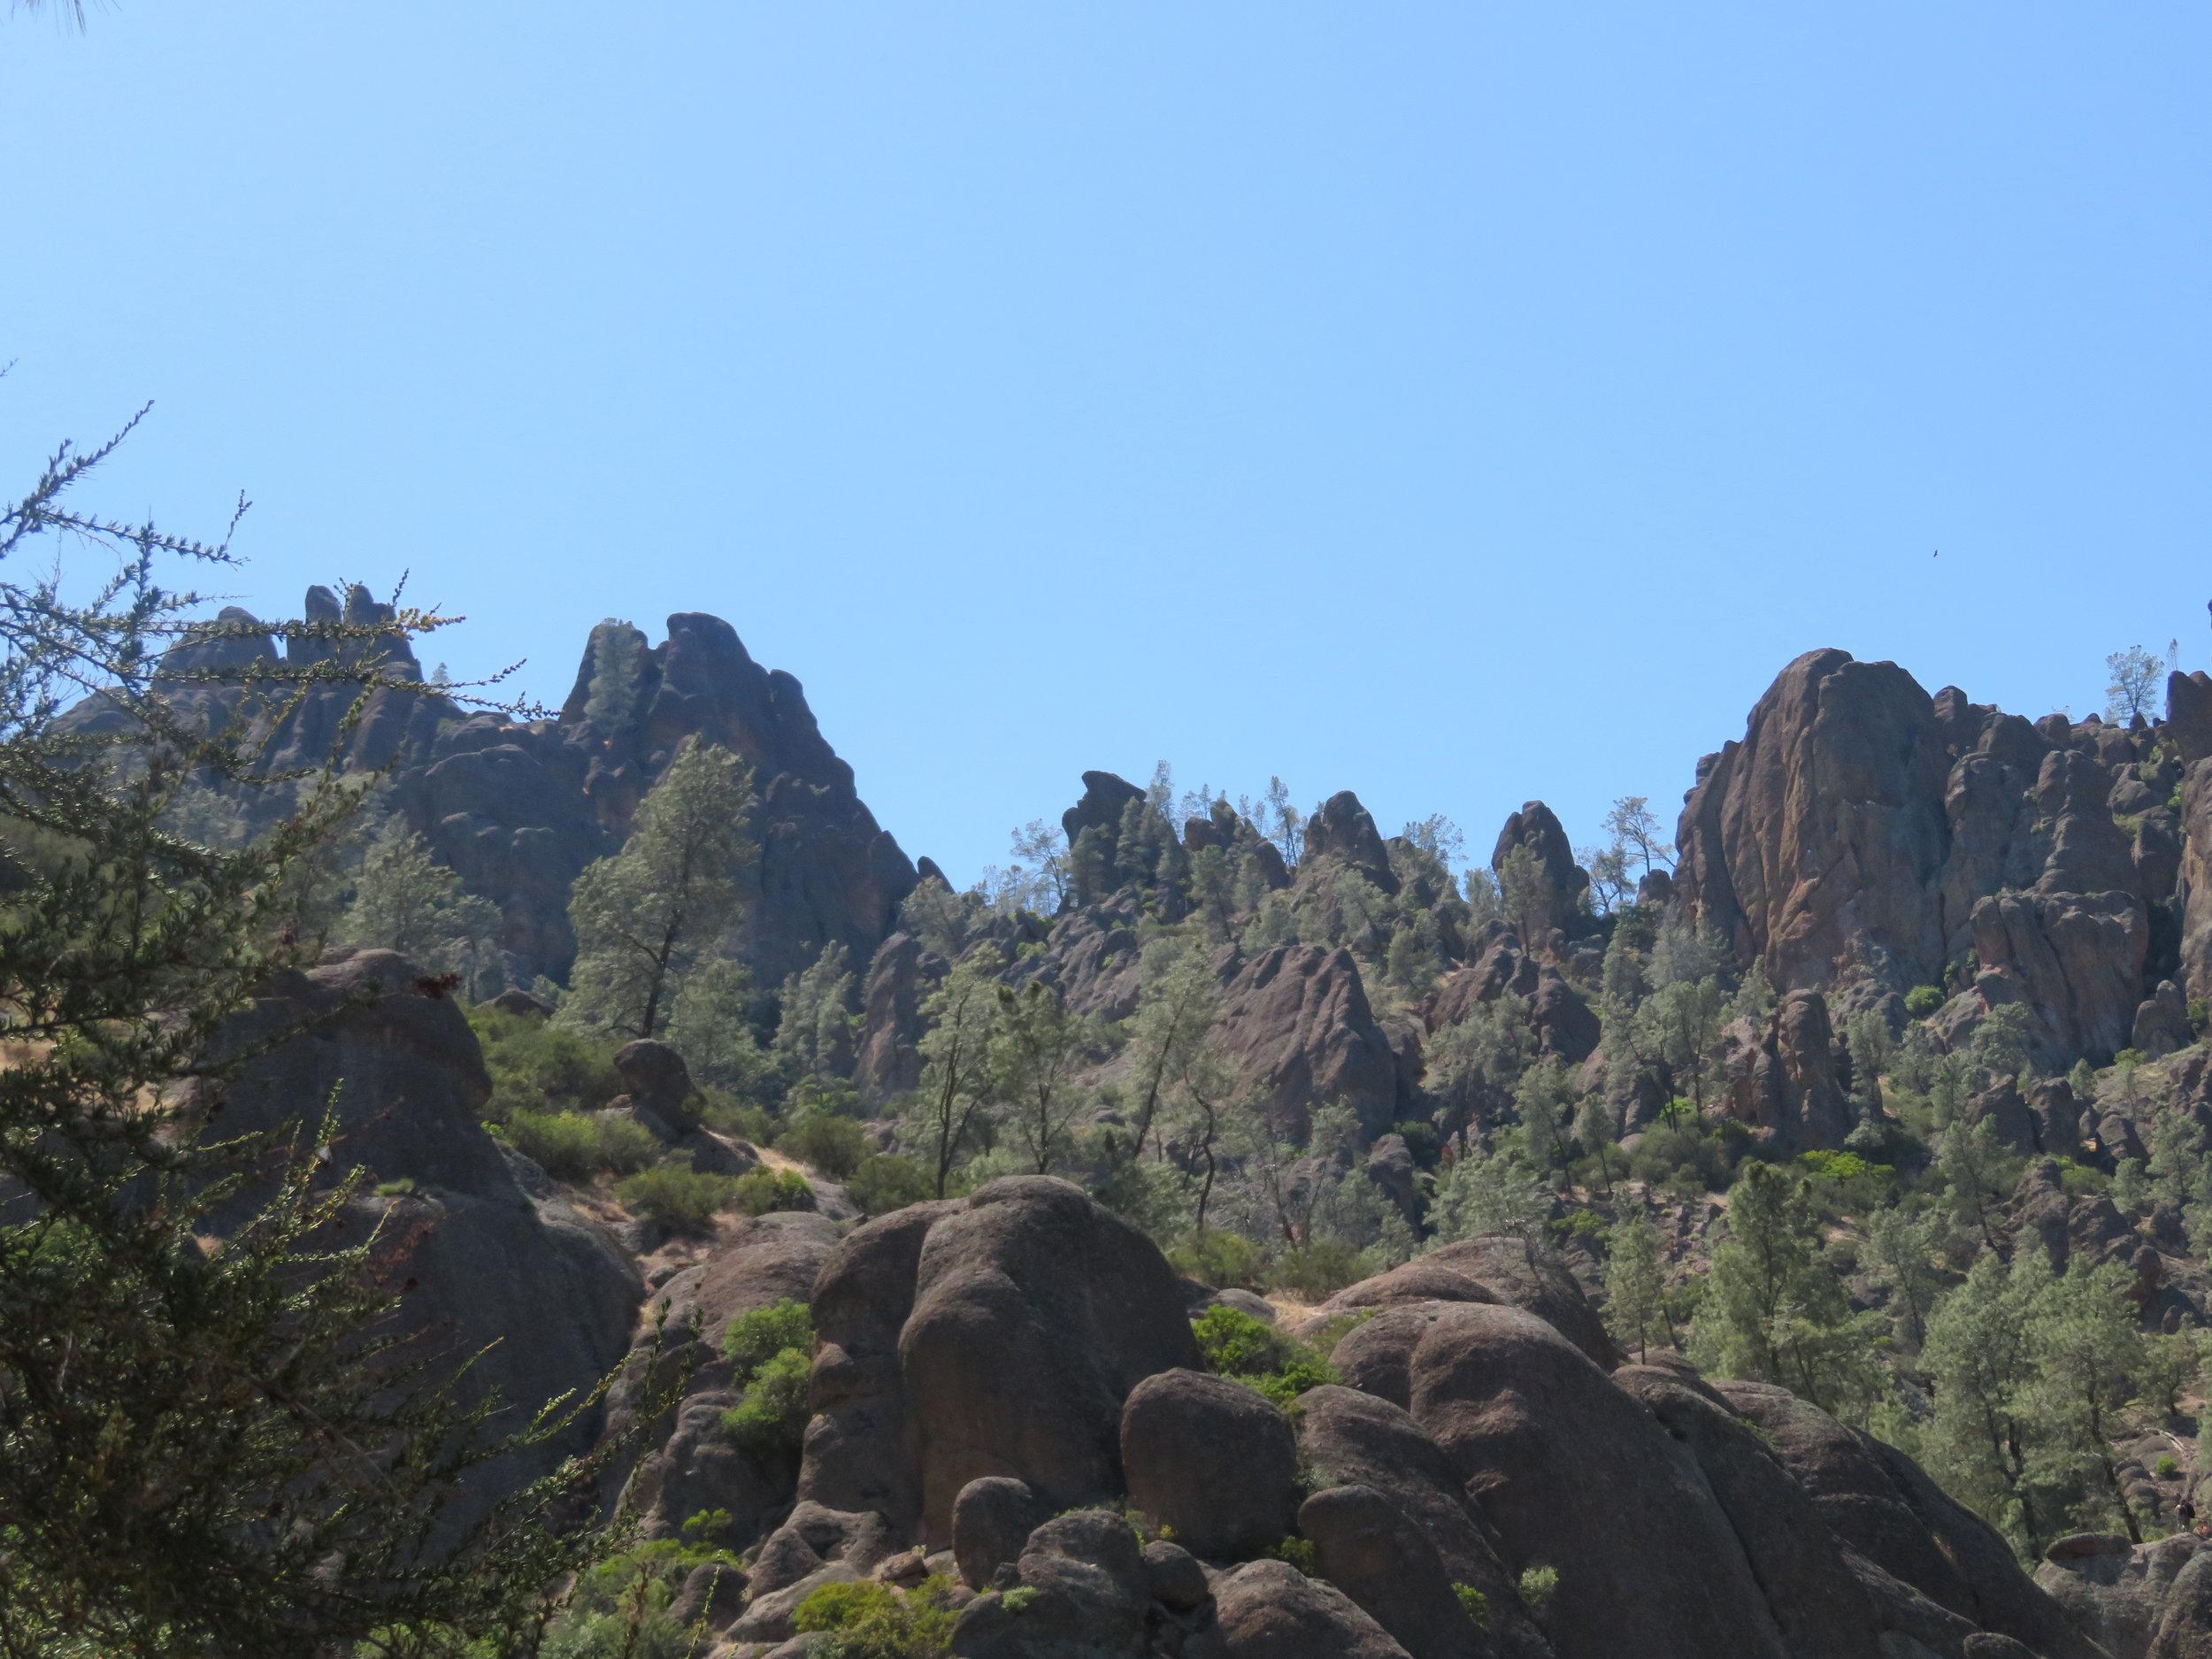 Pinnacle views were awesome!